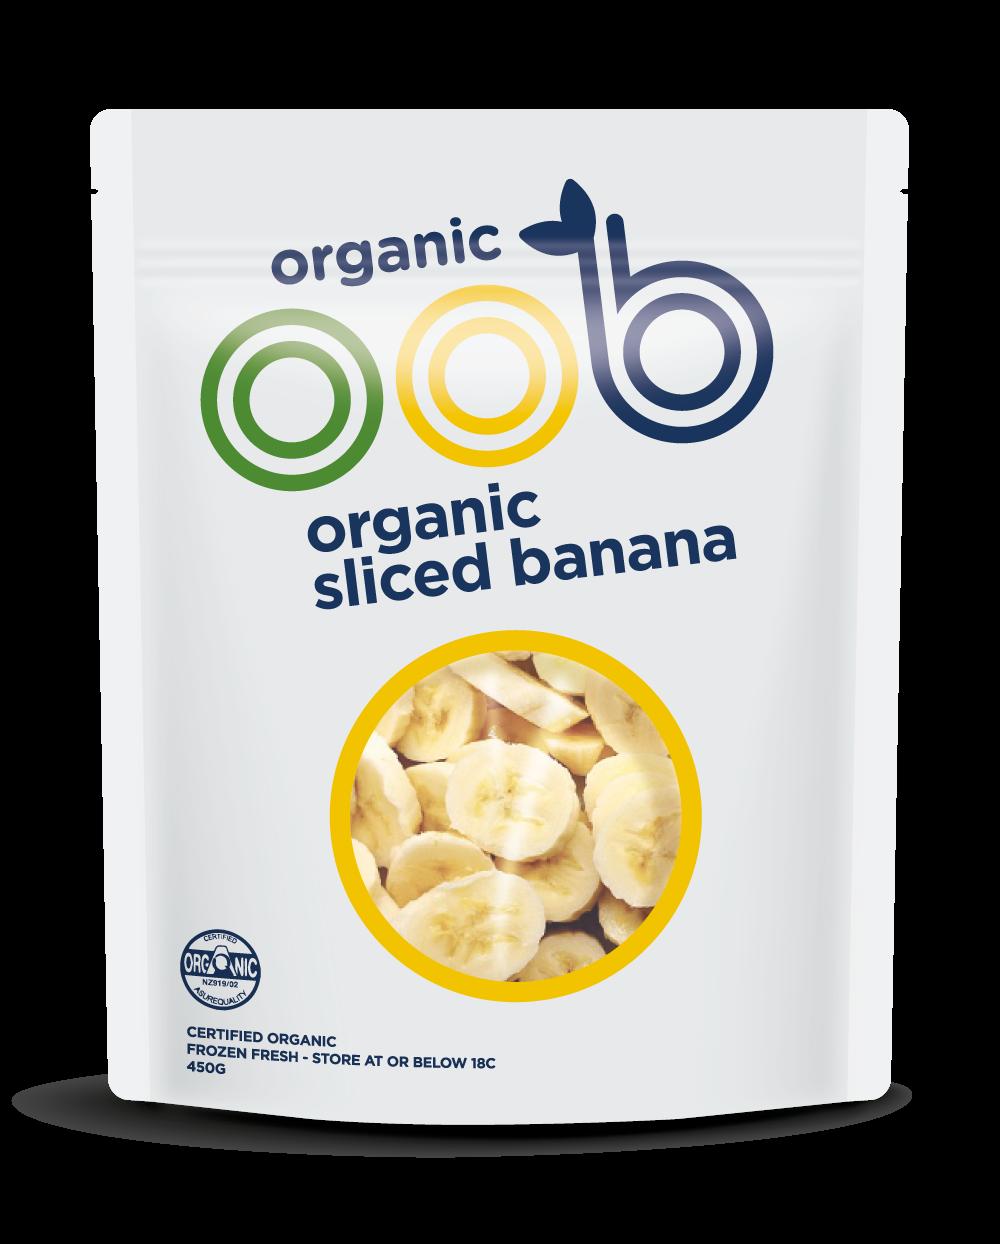 33845-OOB-Single-Fruit-Range-Banana-Mockup.png